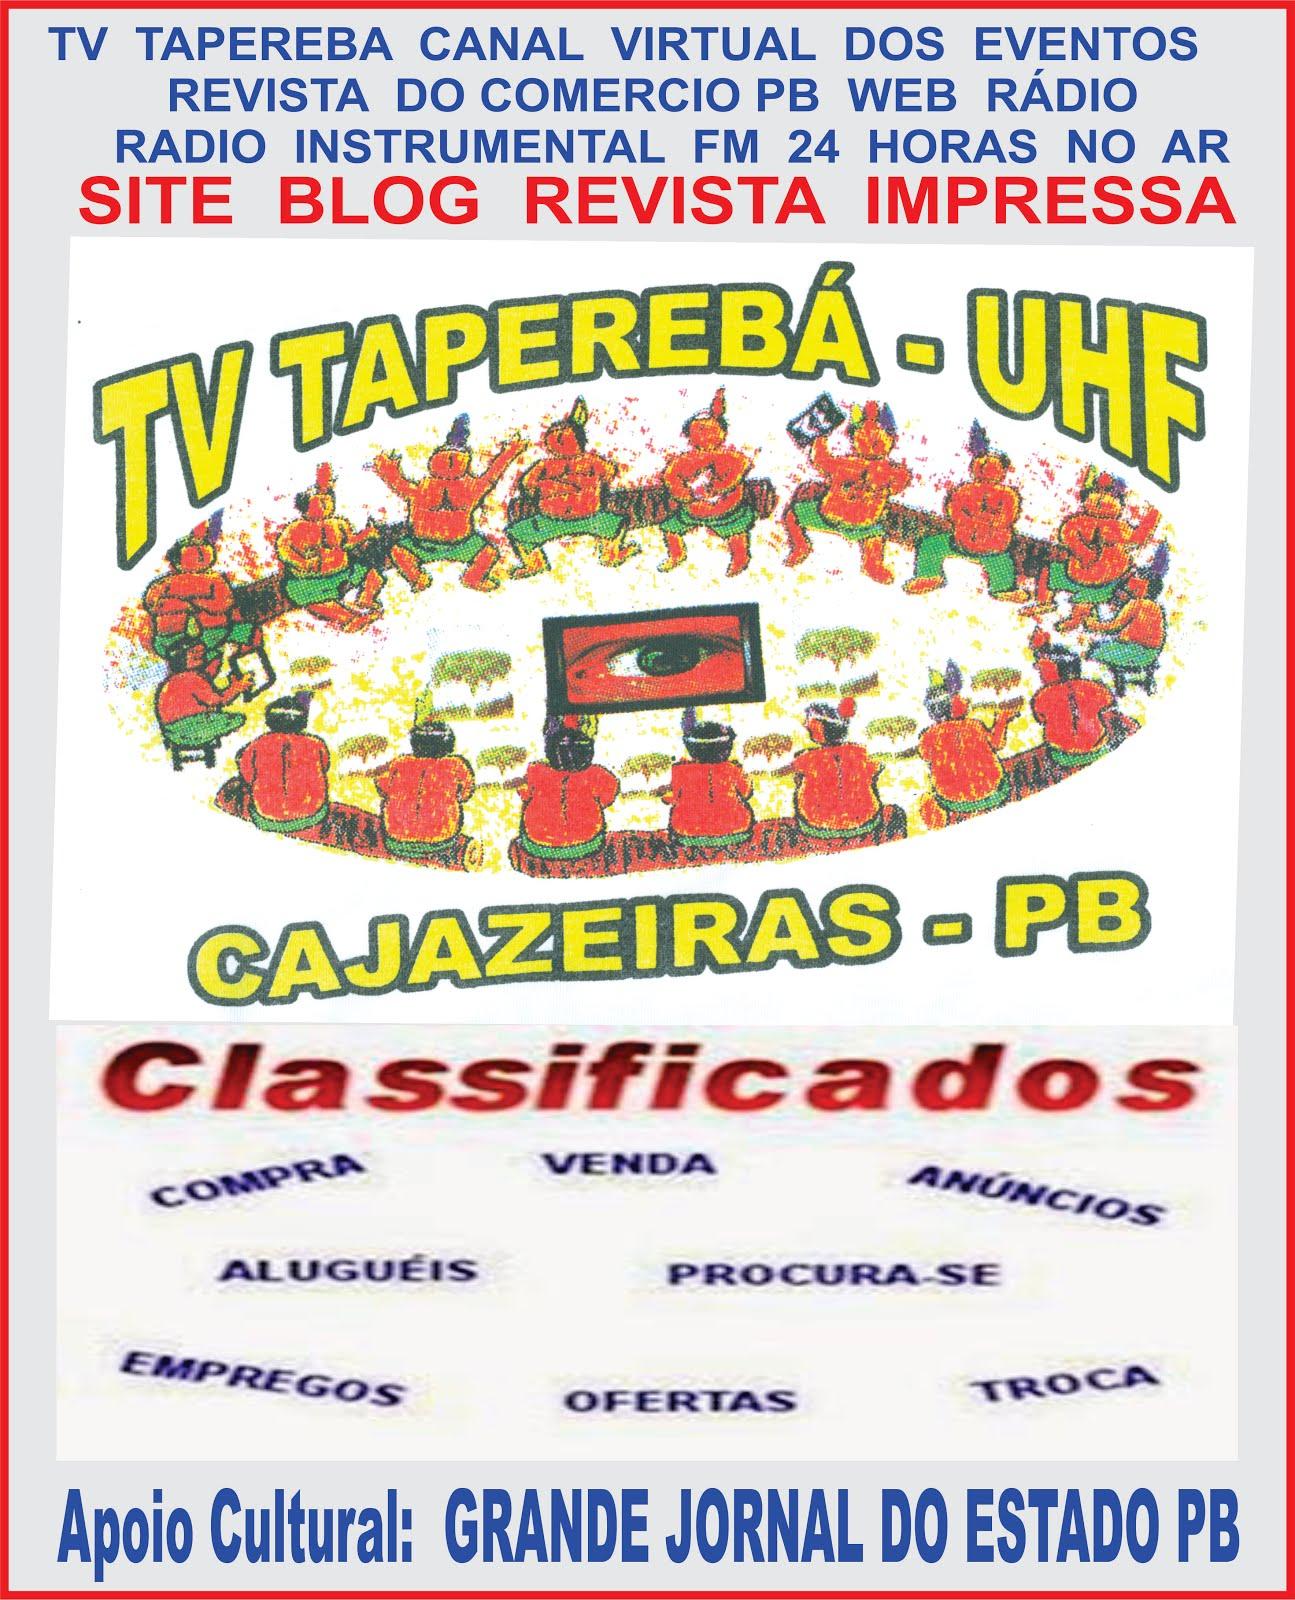 BREVE O CANAL  NO YOUTUBE  NOVA   TV  TAPEREBÁ CAJAZEIRAS PB